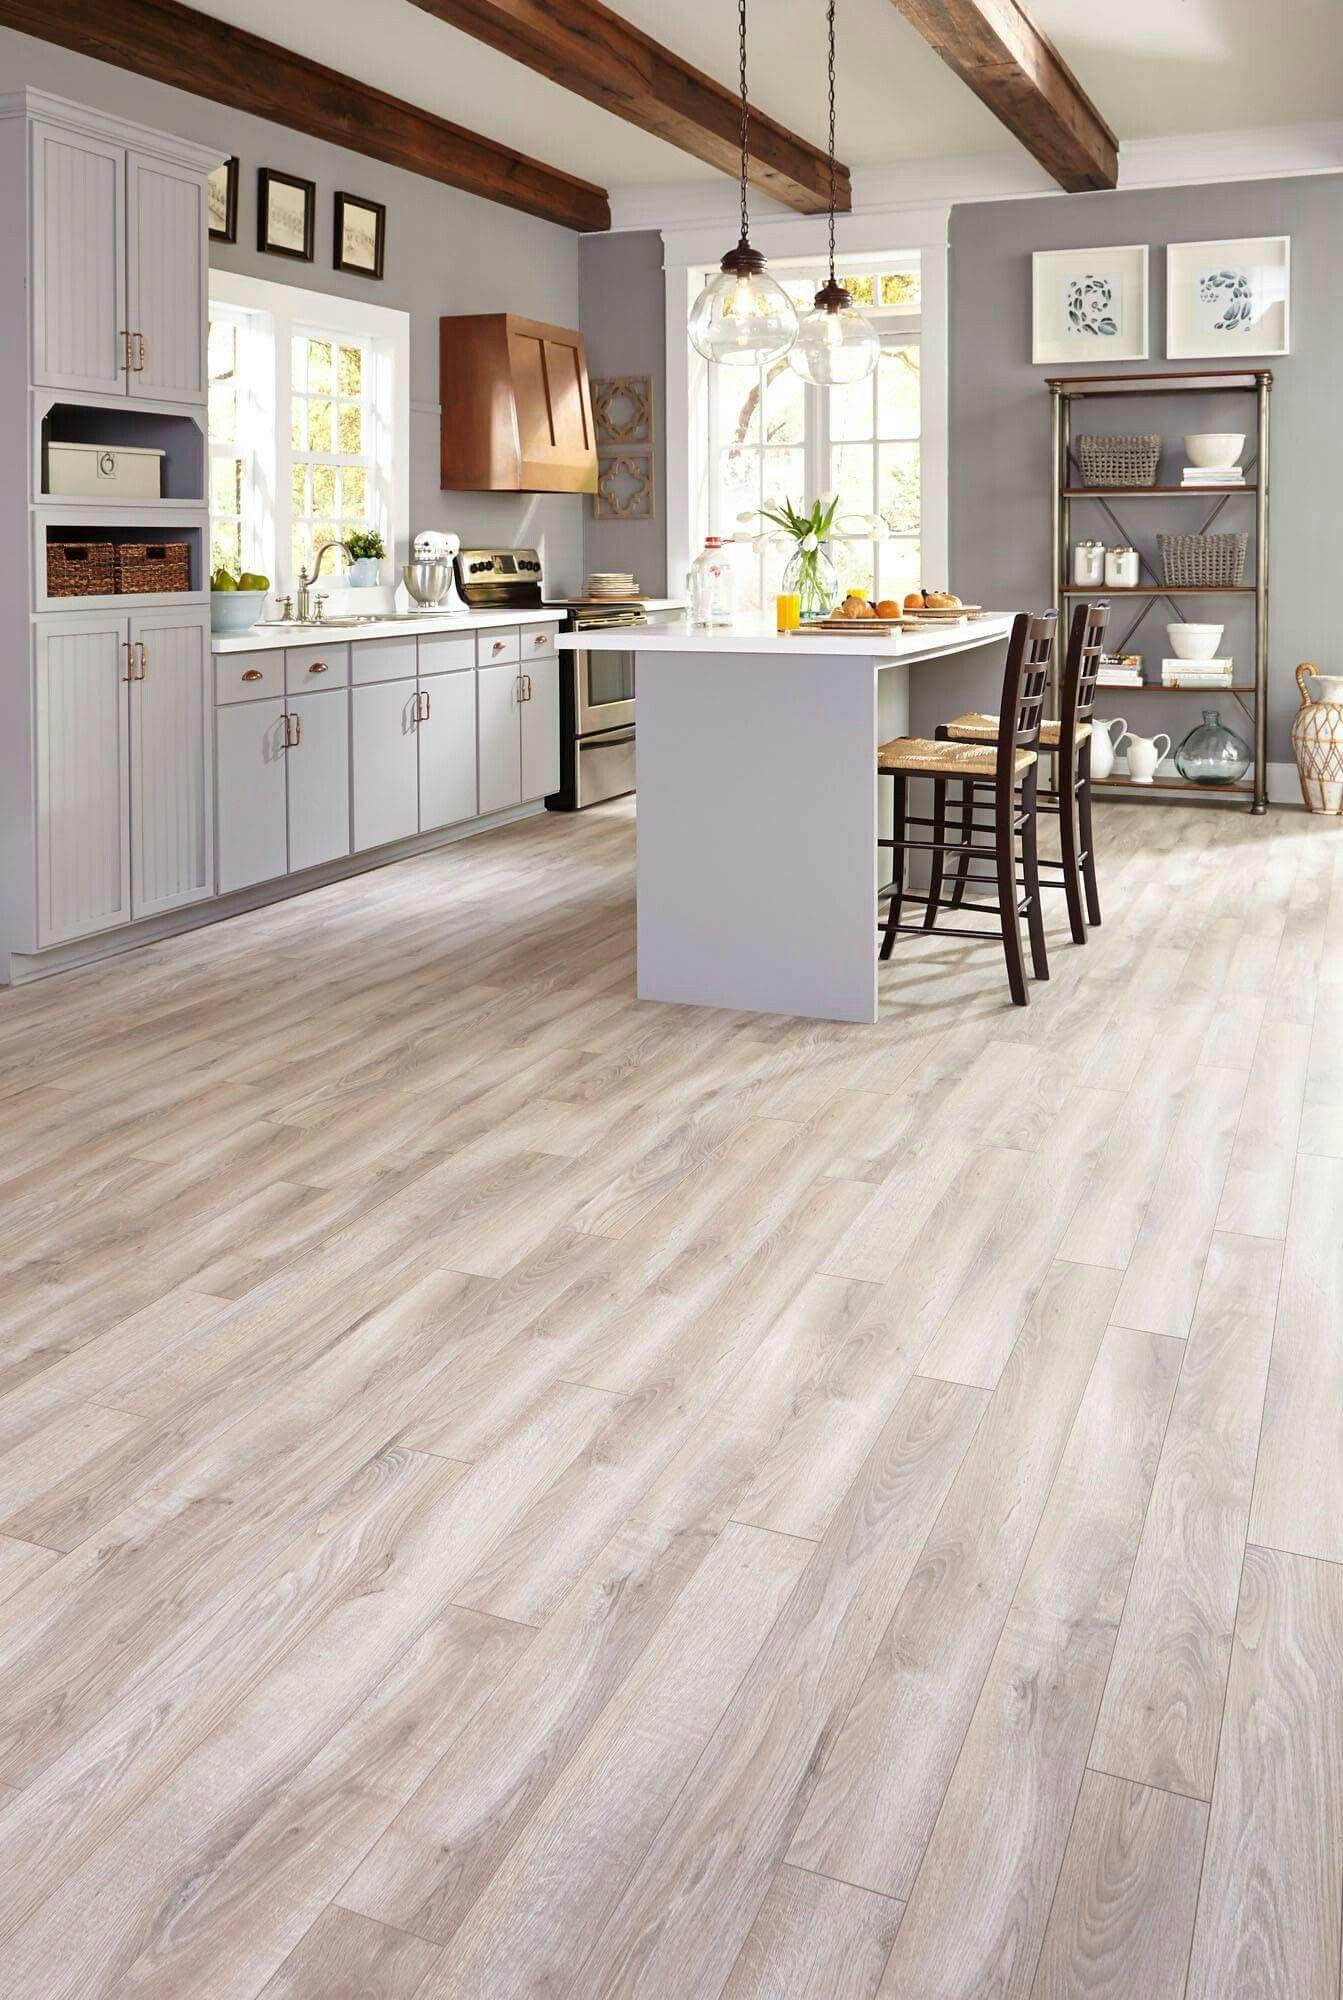 Love It All Kitchen Flooring Waterproof Laminate